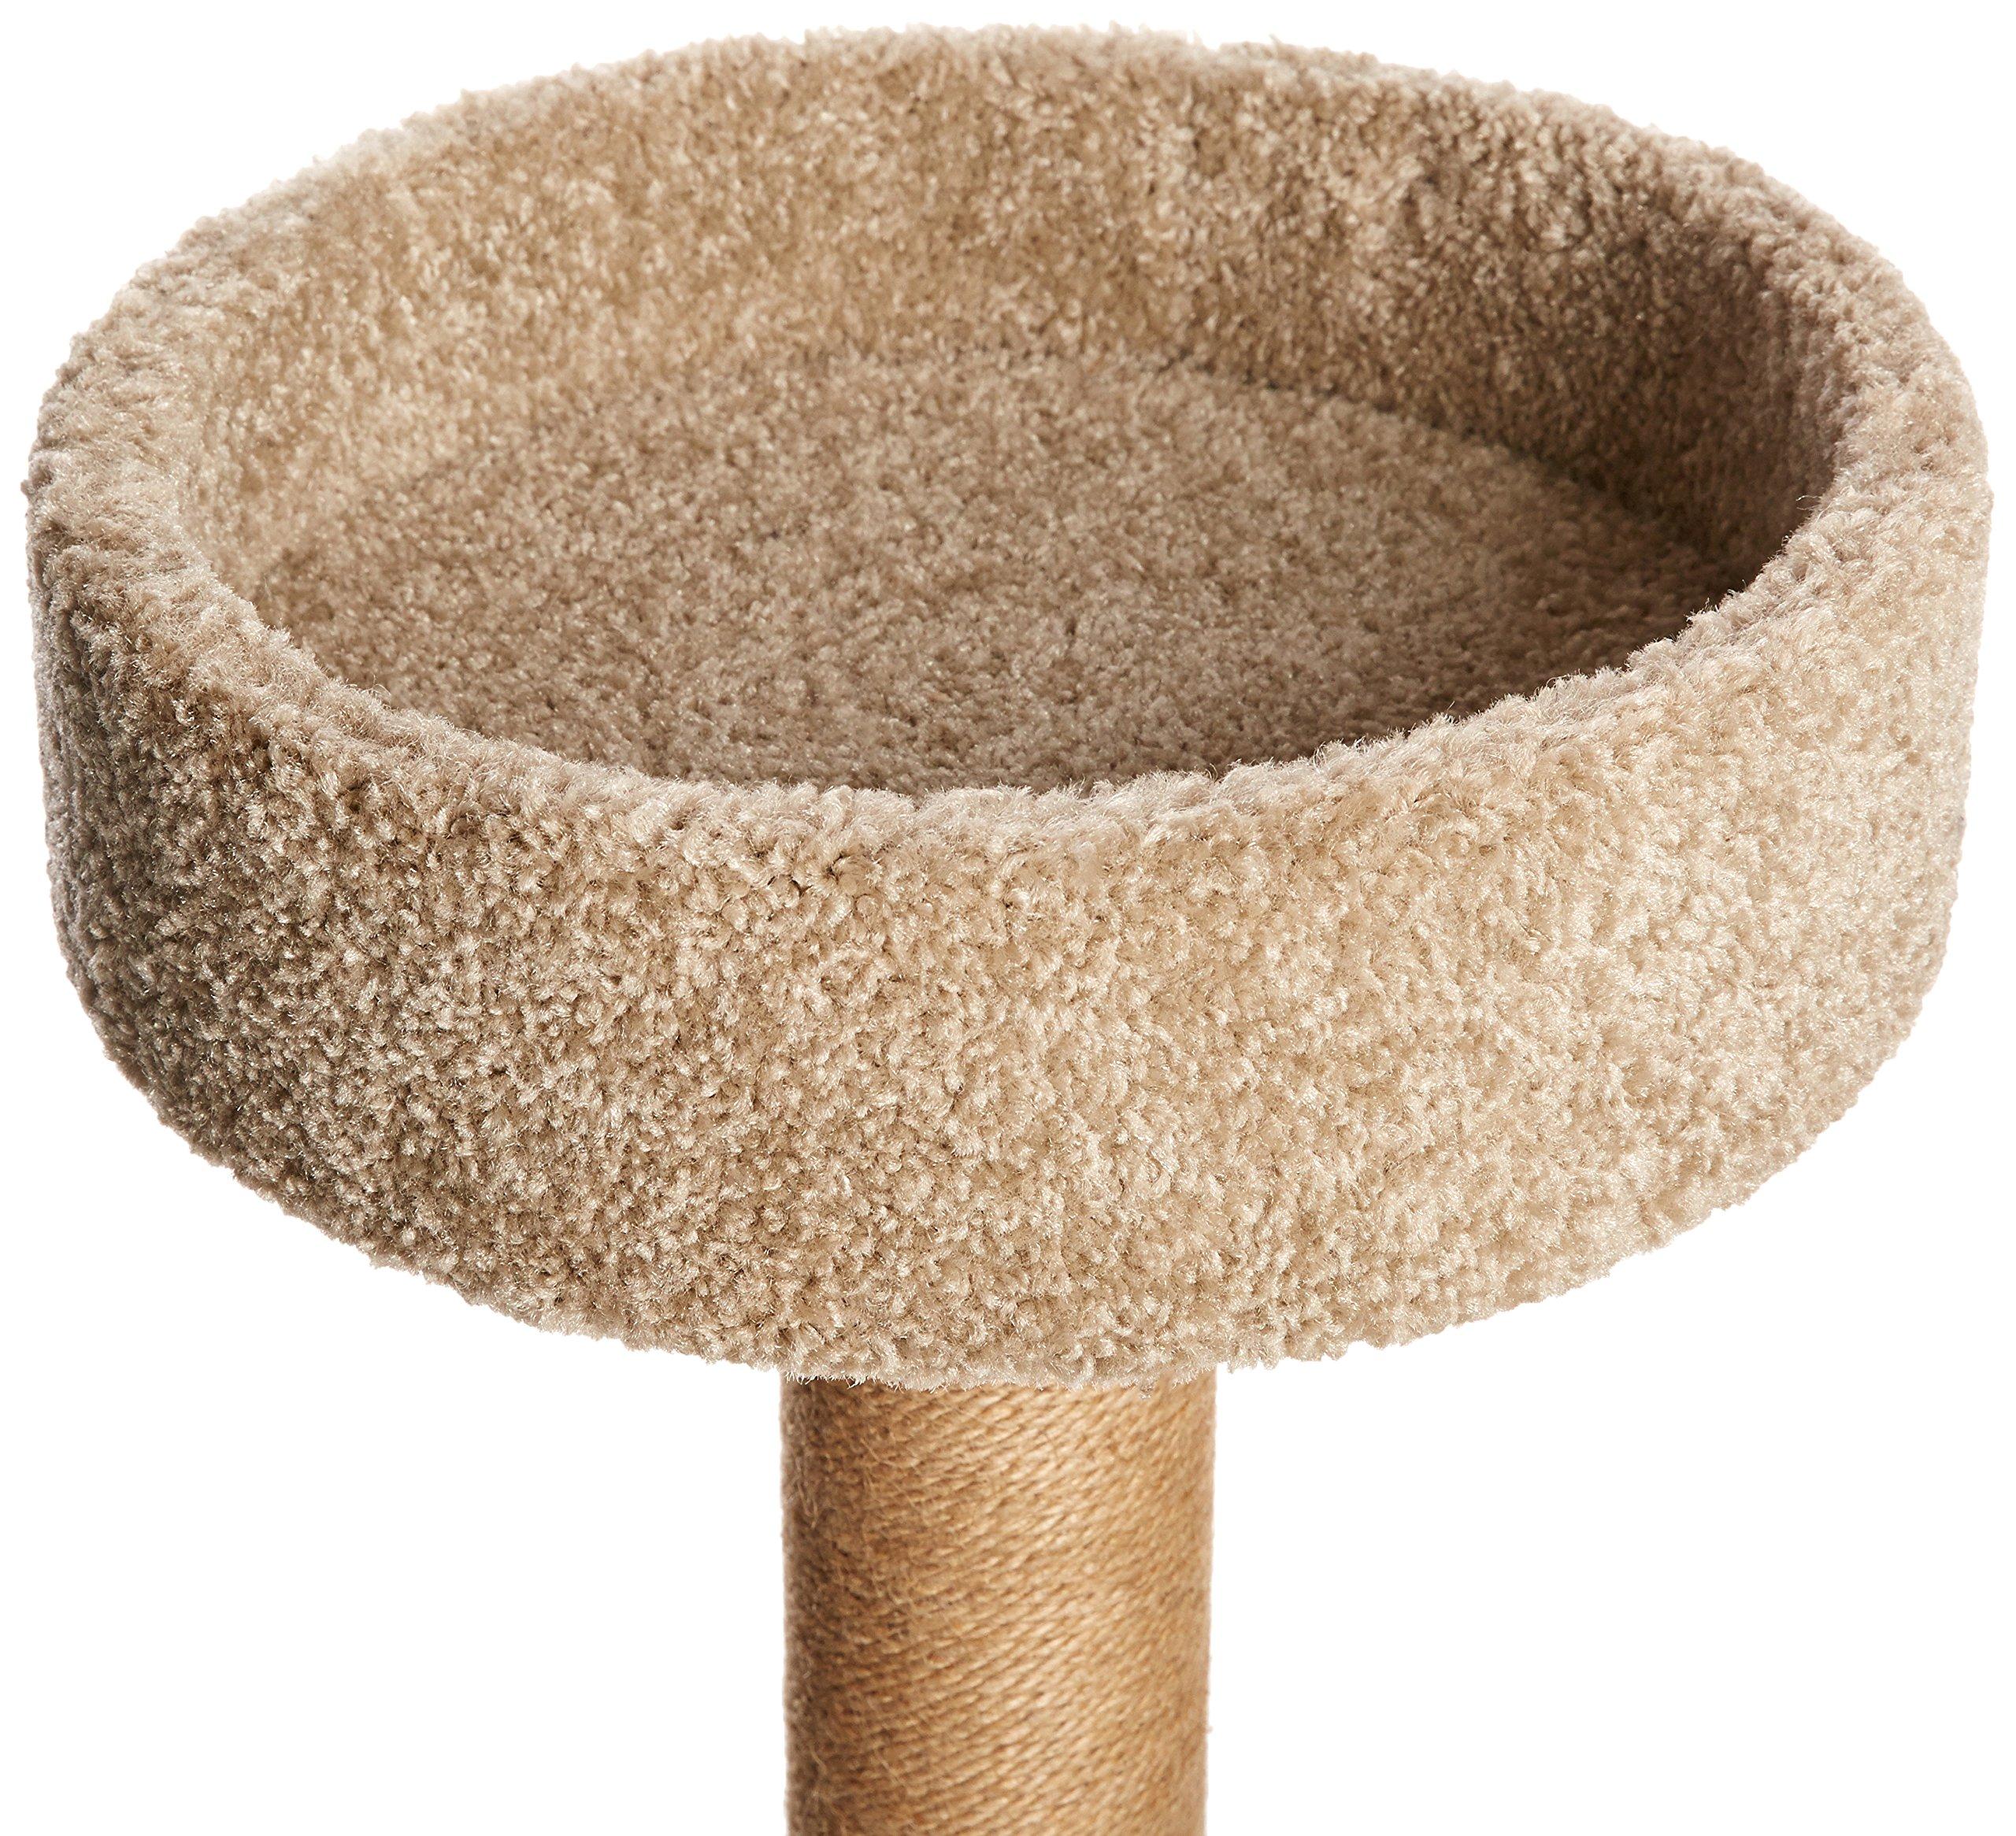 AmazonBasics Cat Activity Tree with Scratching Posts 3